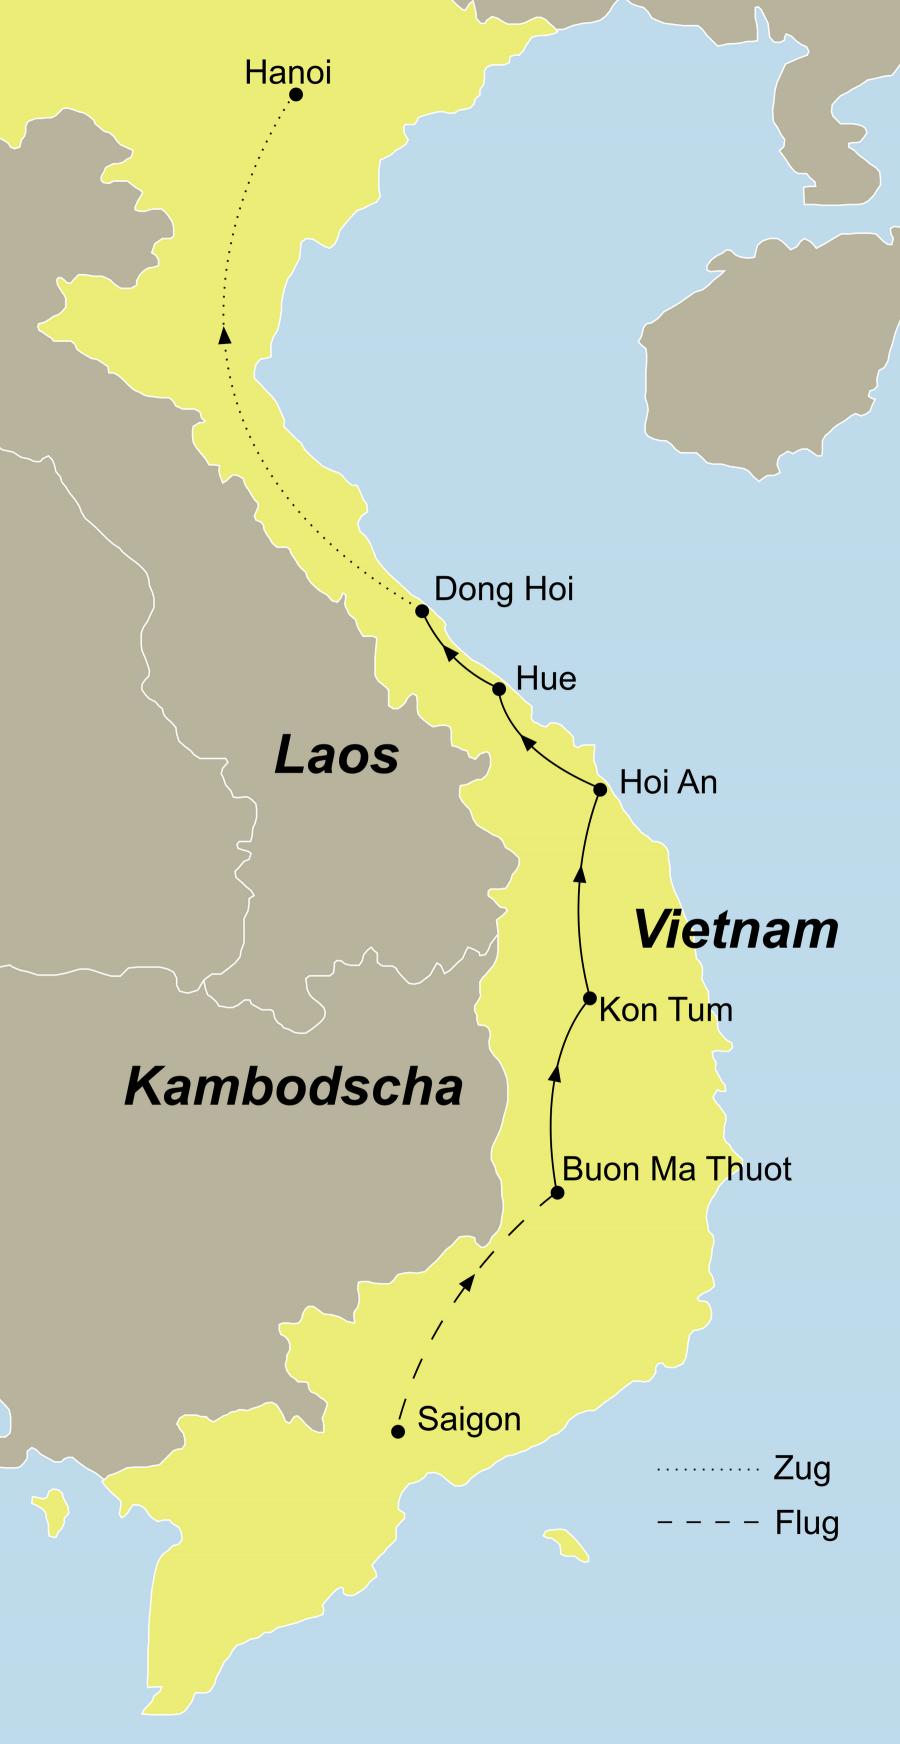 Die Vietnam Rundresie führt von Saigon über Buon Ma Thuot – Kon Tum – Hoi An – My Son – Hue – Phong Nga Nationalpark nach Hanoi.